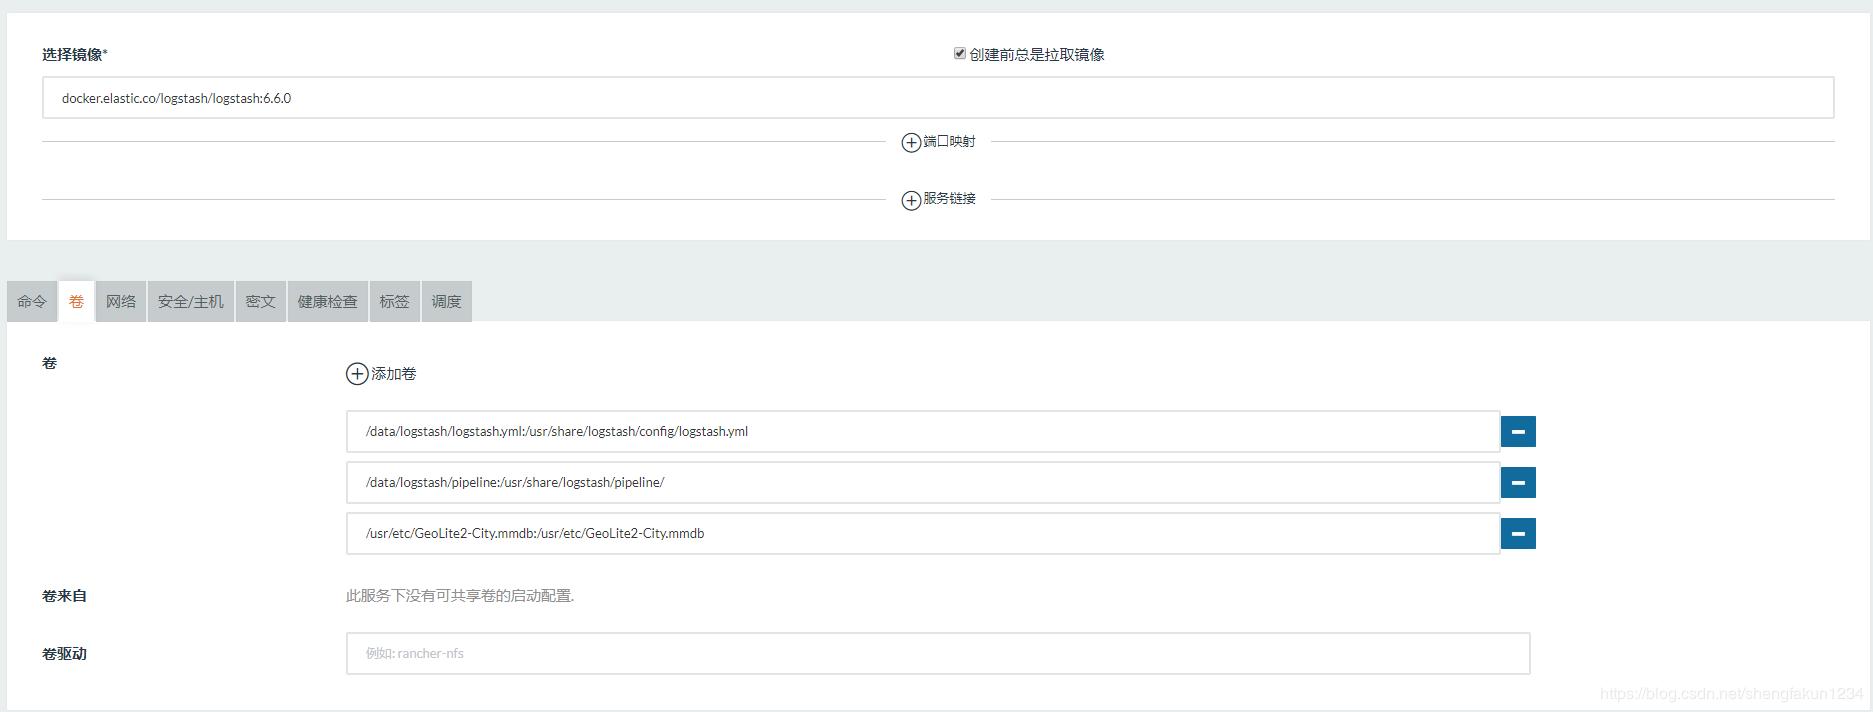 Filebeat Multiline Example